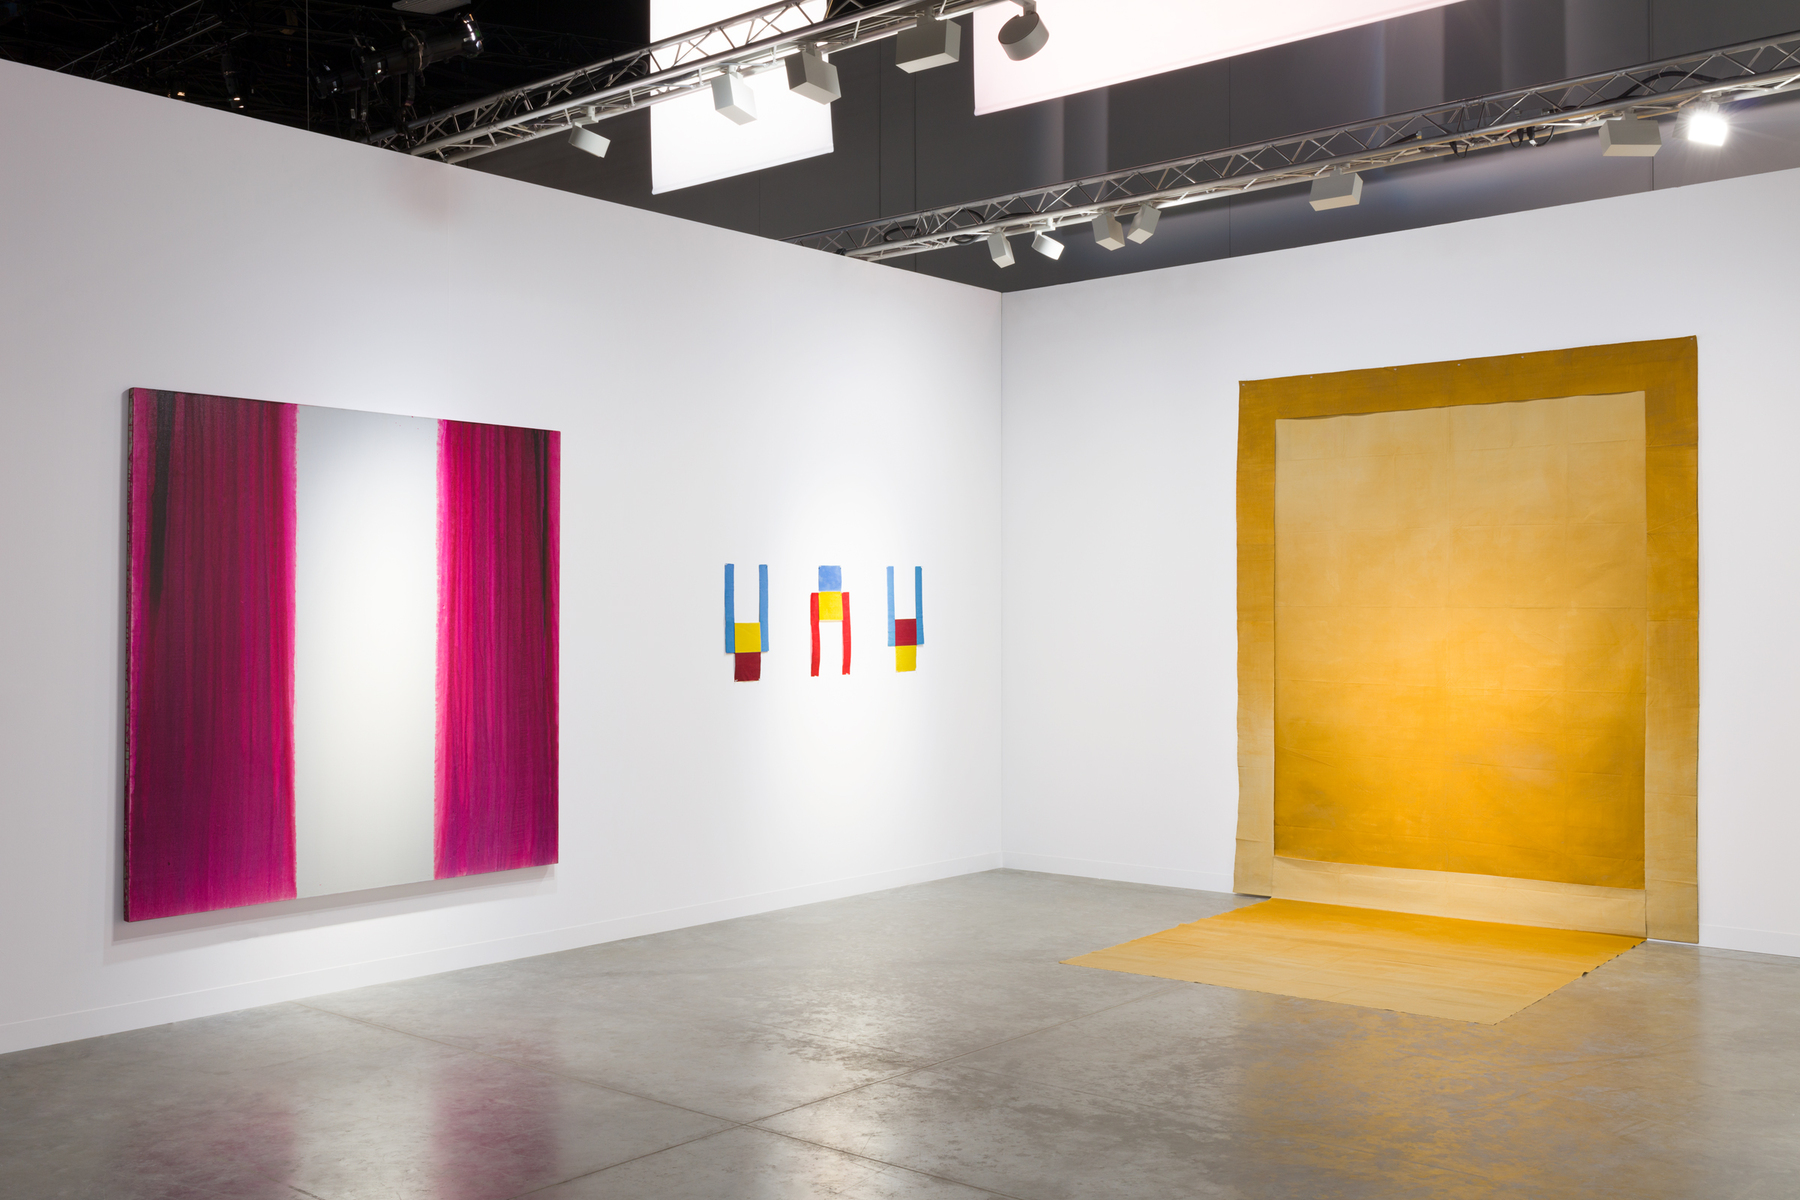 6_Art Basel Miami Beac 2018 70